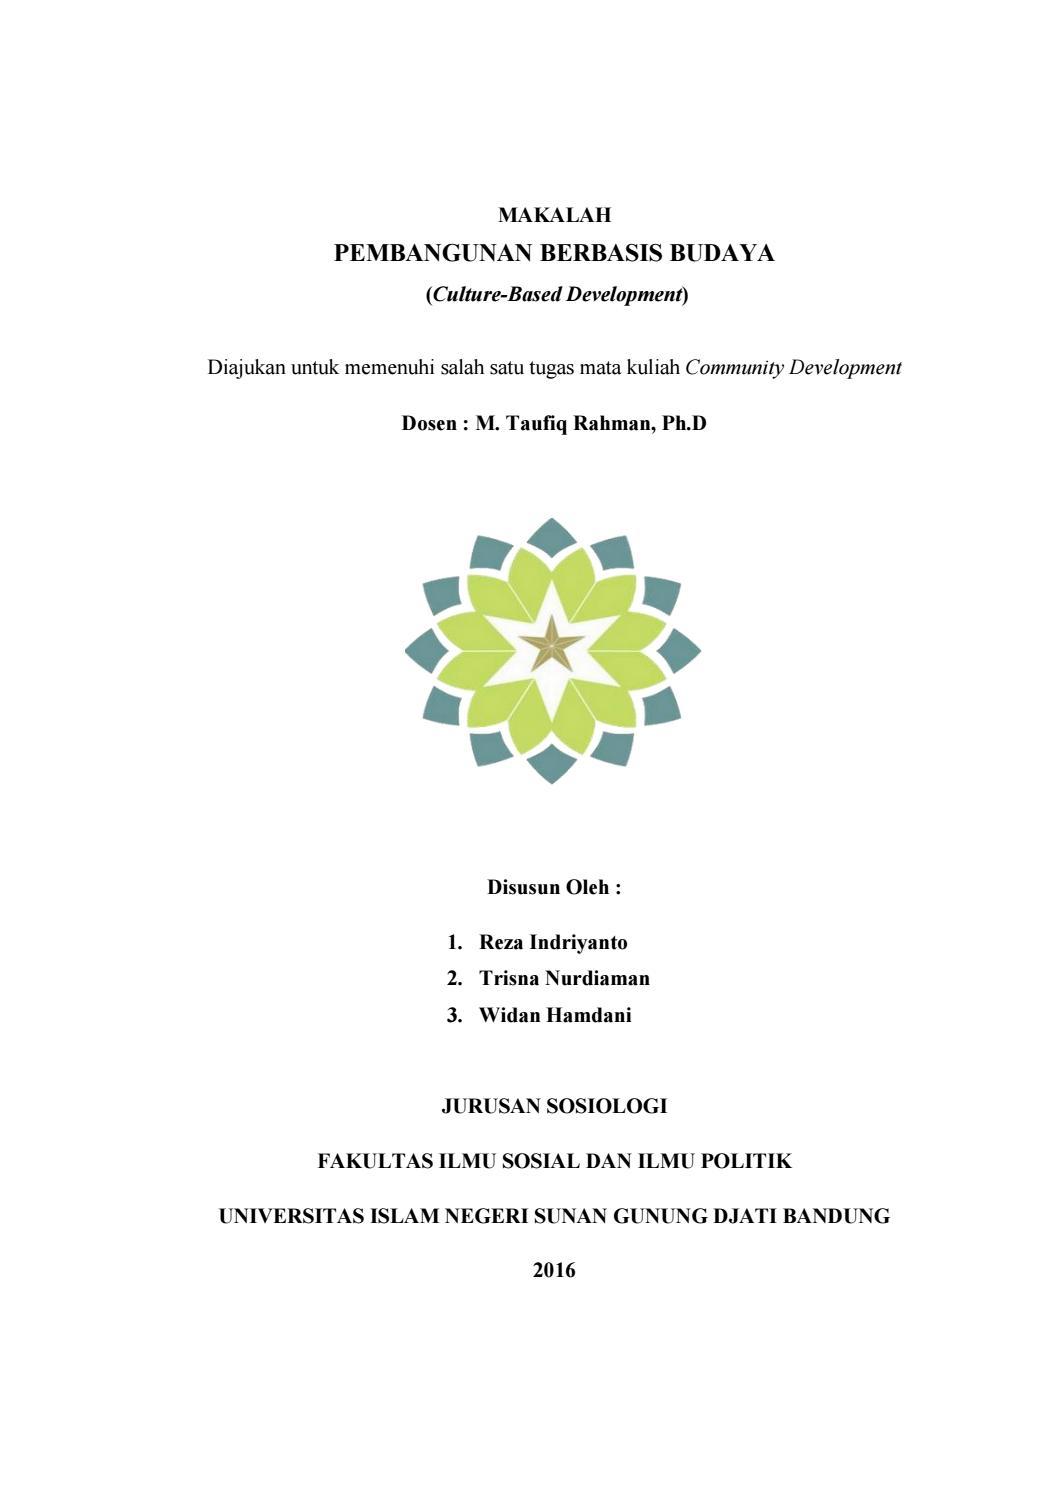 13/06/2016· contoh makalah sosiologi pembangunan. Makalah pembangunan berbasis budaya by Trisna Nurdiaman